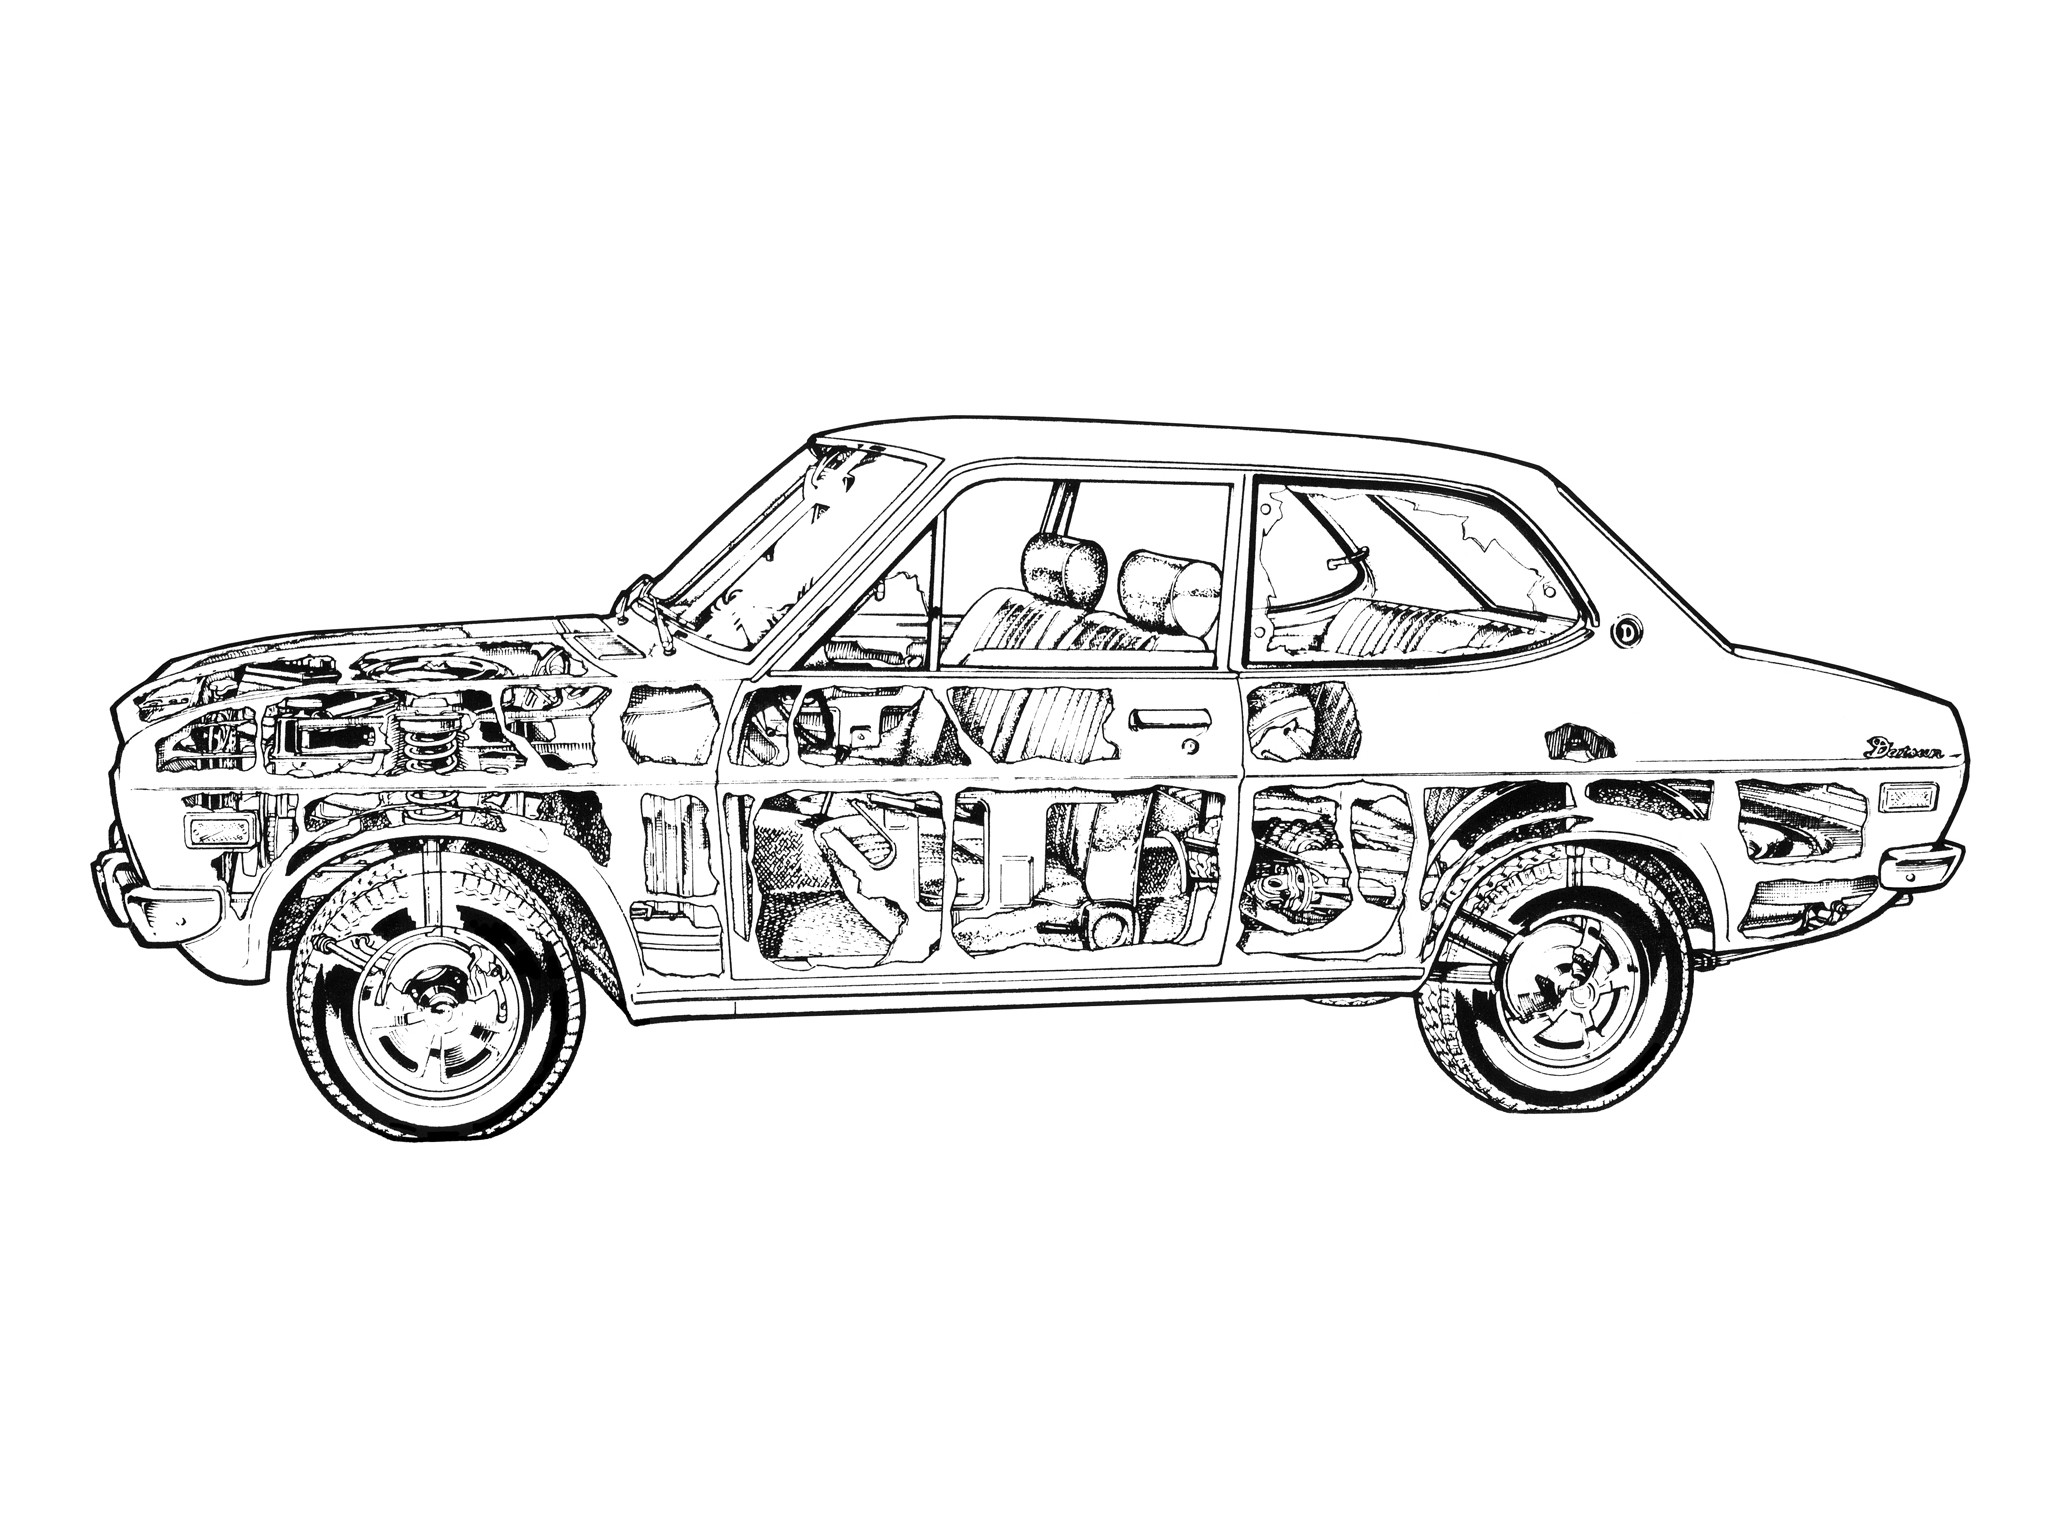 Fondos De Pantalla Dibujo Vehiculo Arte Lineal